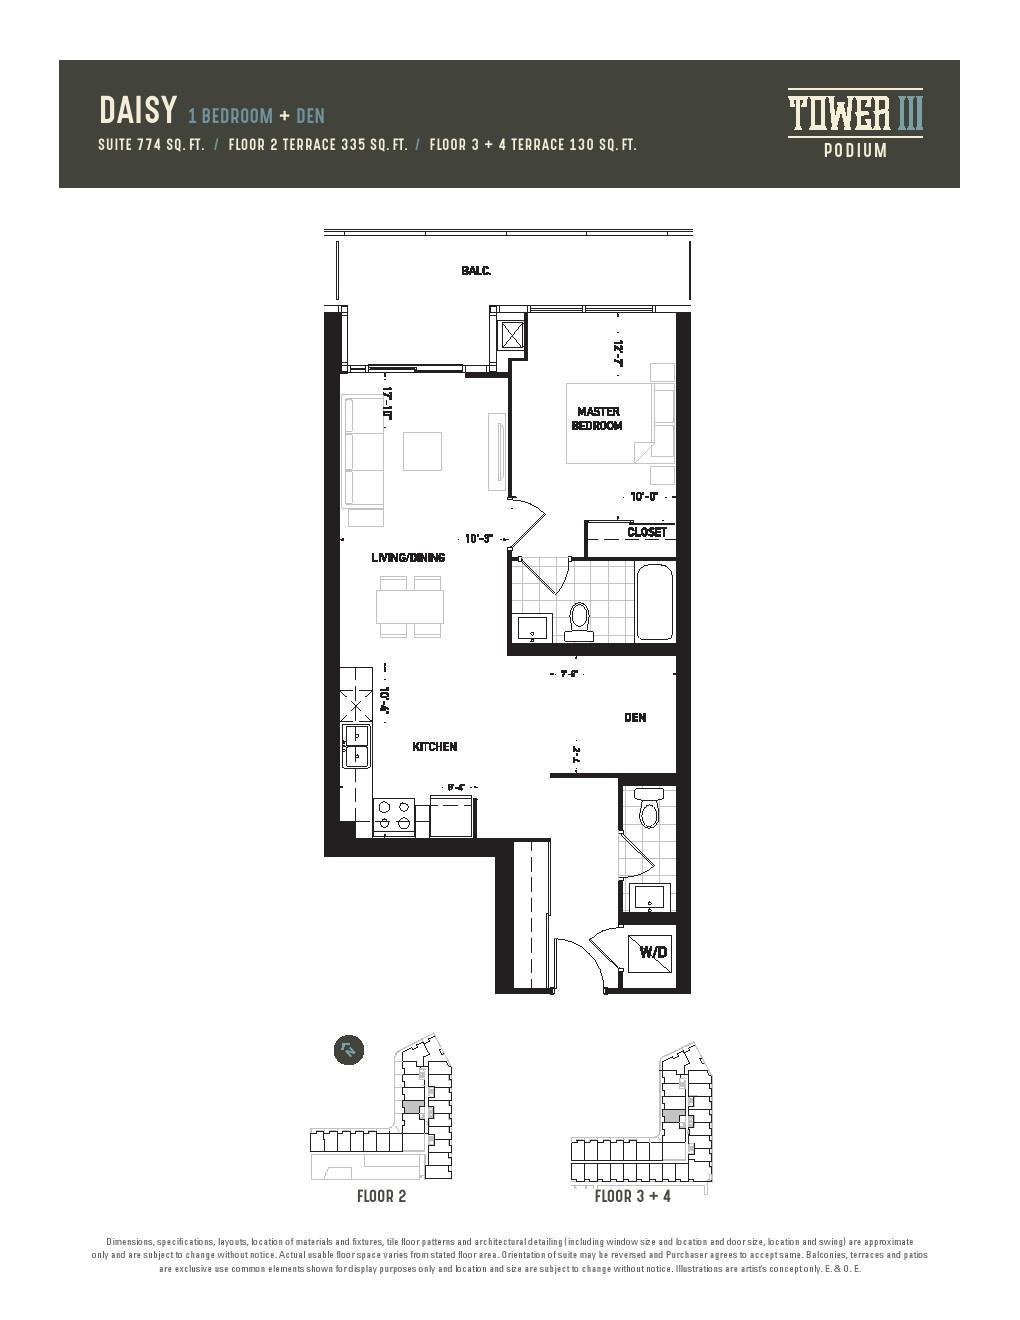 Oak & Co Condos Tower III